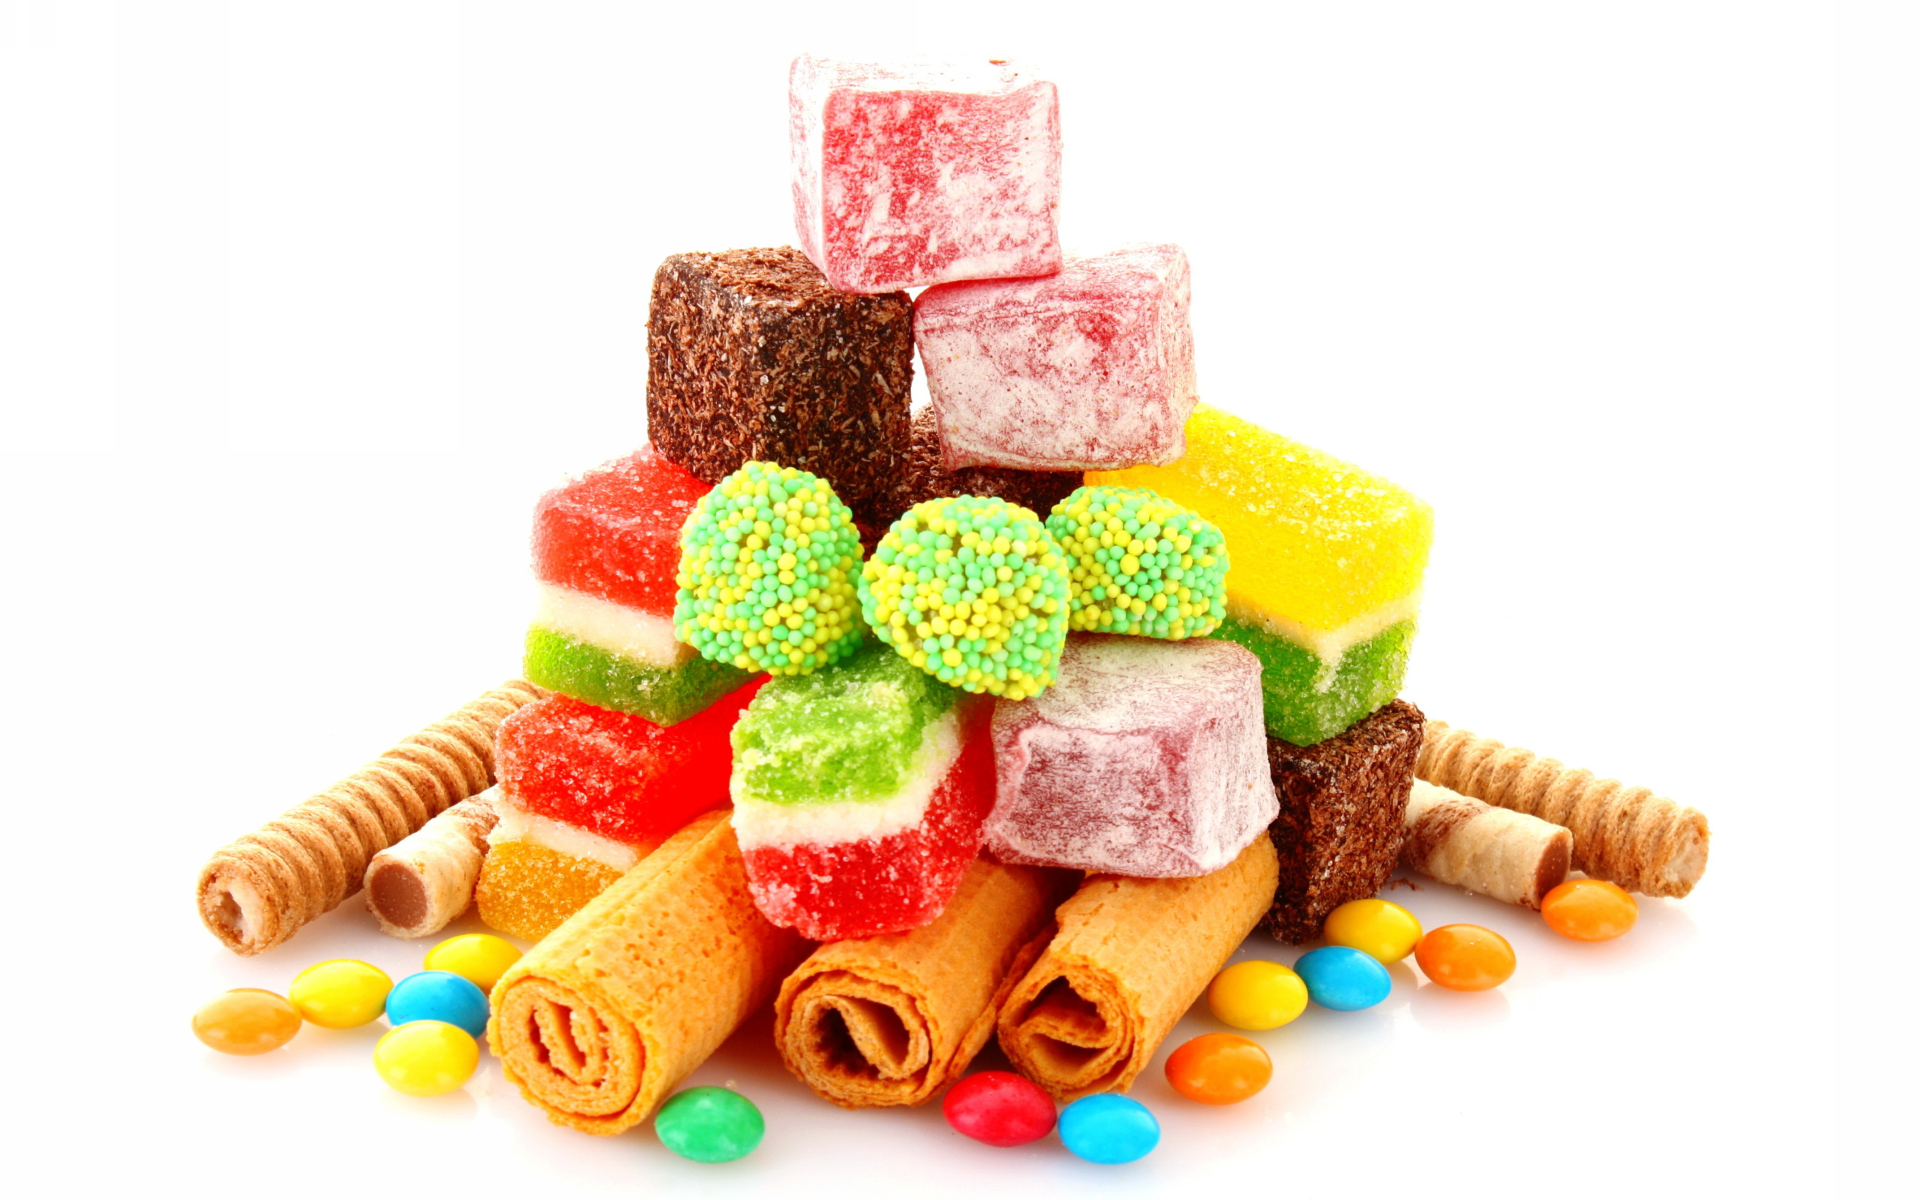 Коллективу февраля, картинки со сладостями для детей